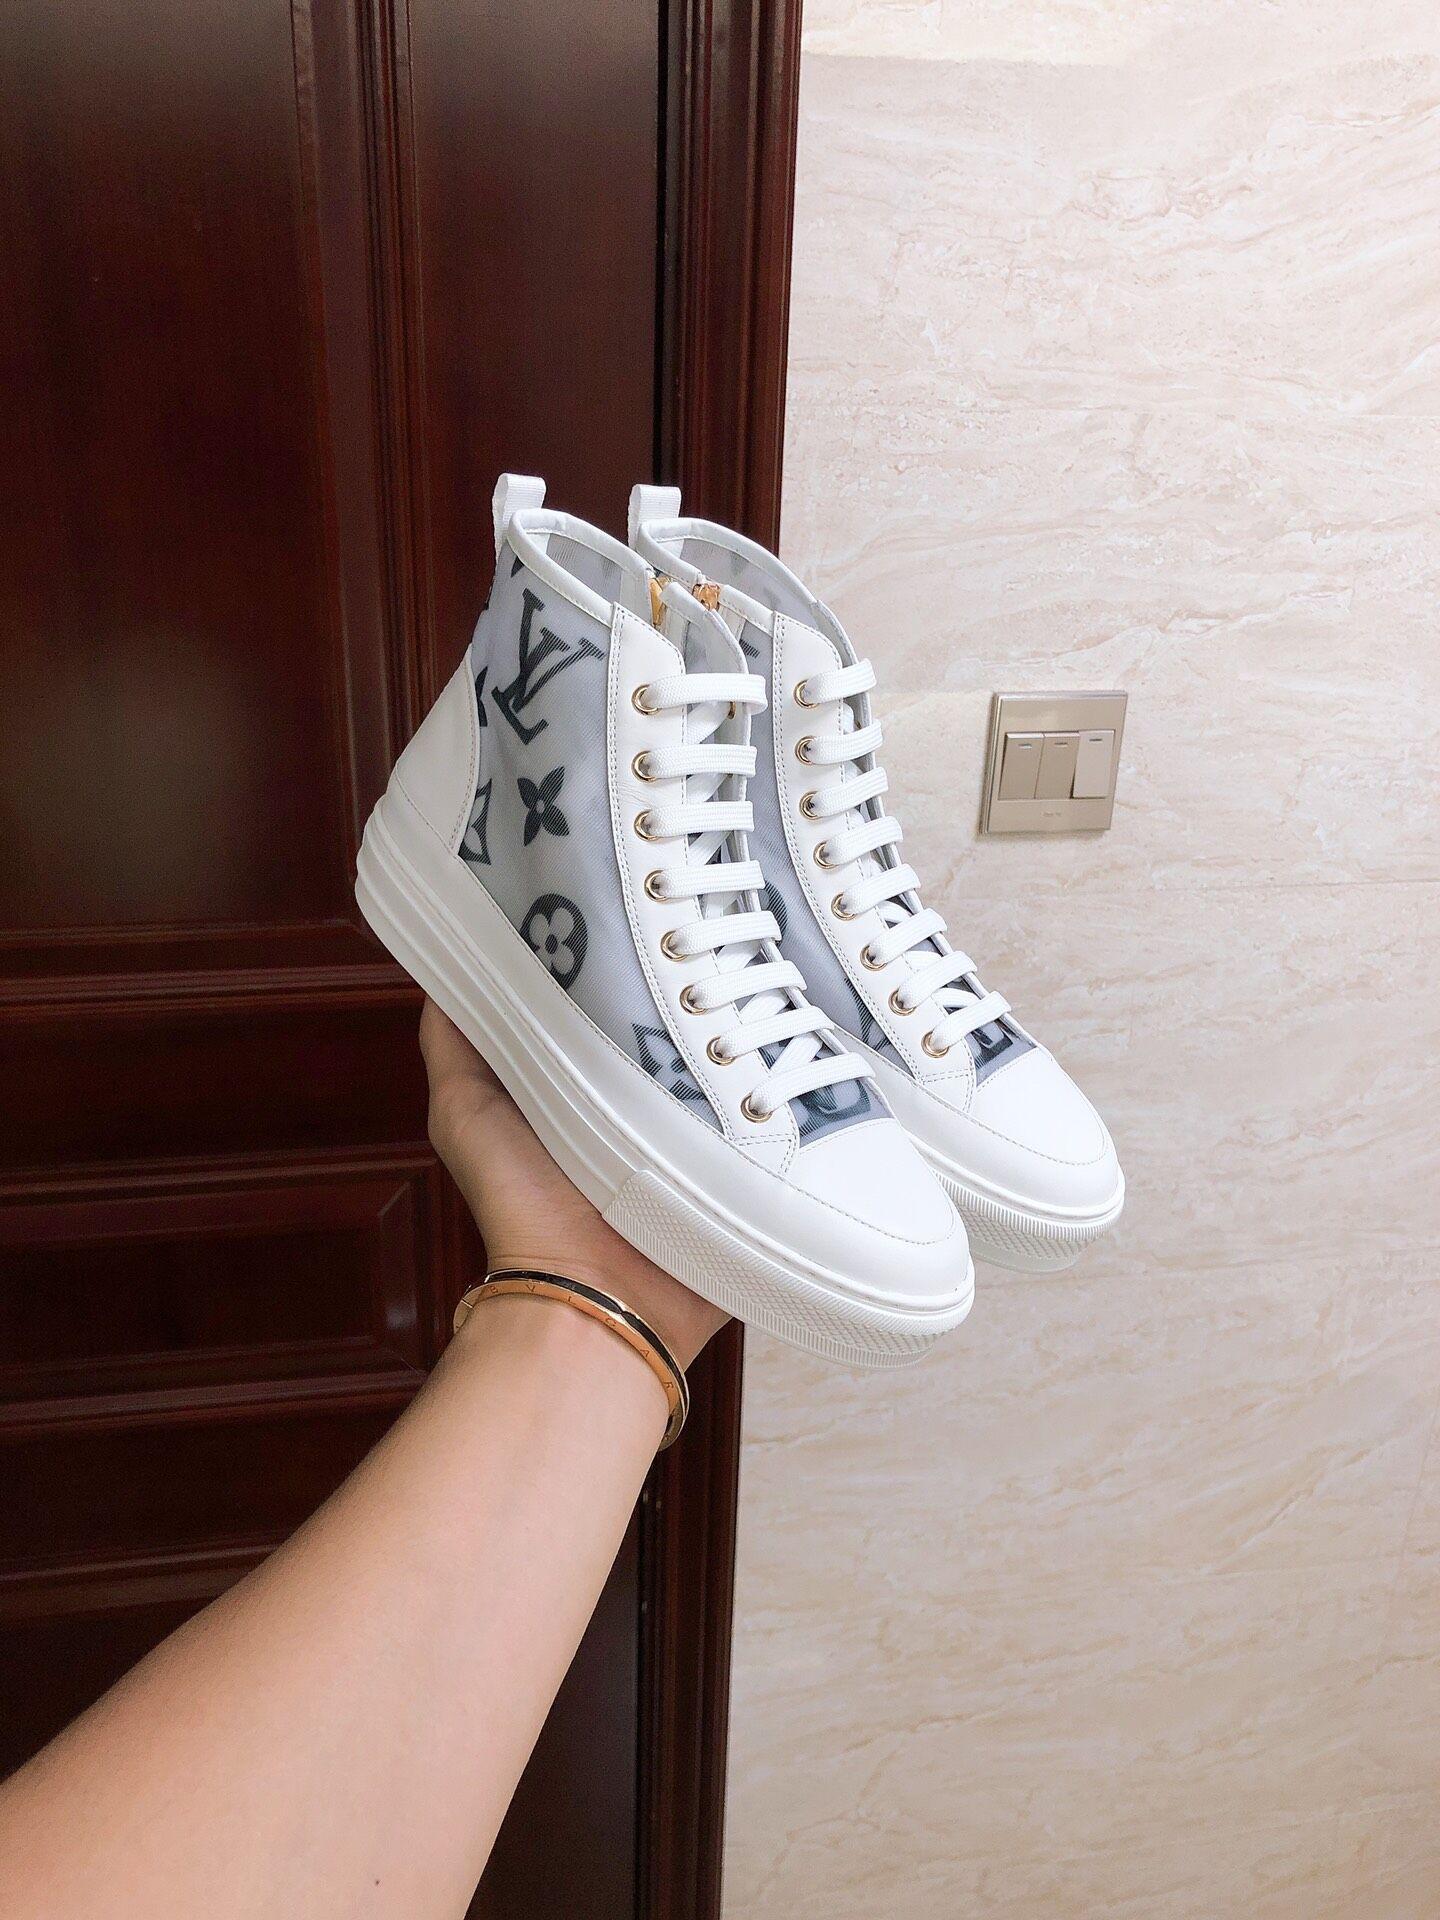 stellar sneaker boot black    sneaker    shoes    women shoes 1A87E6  2